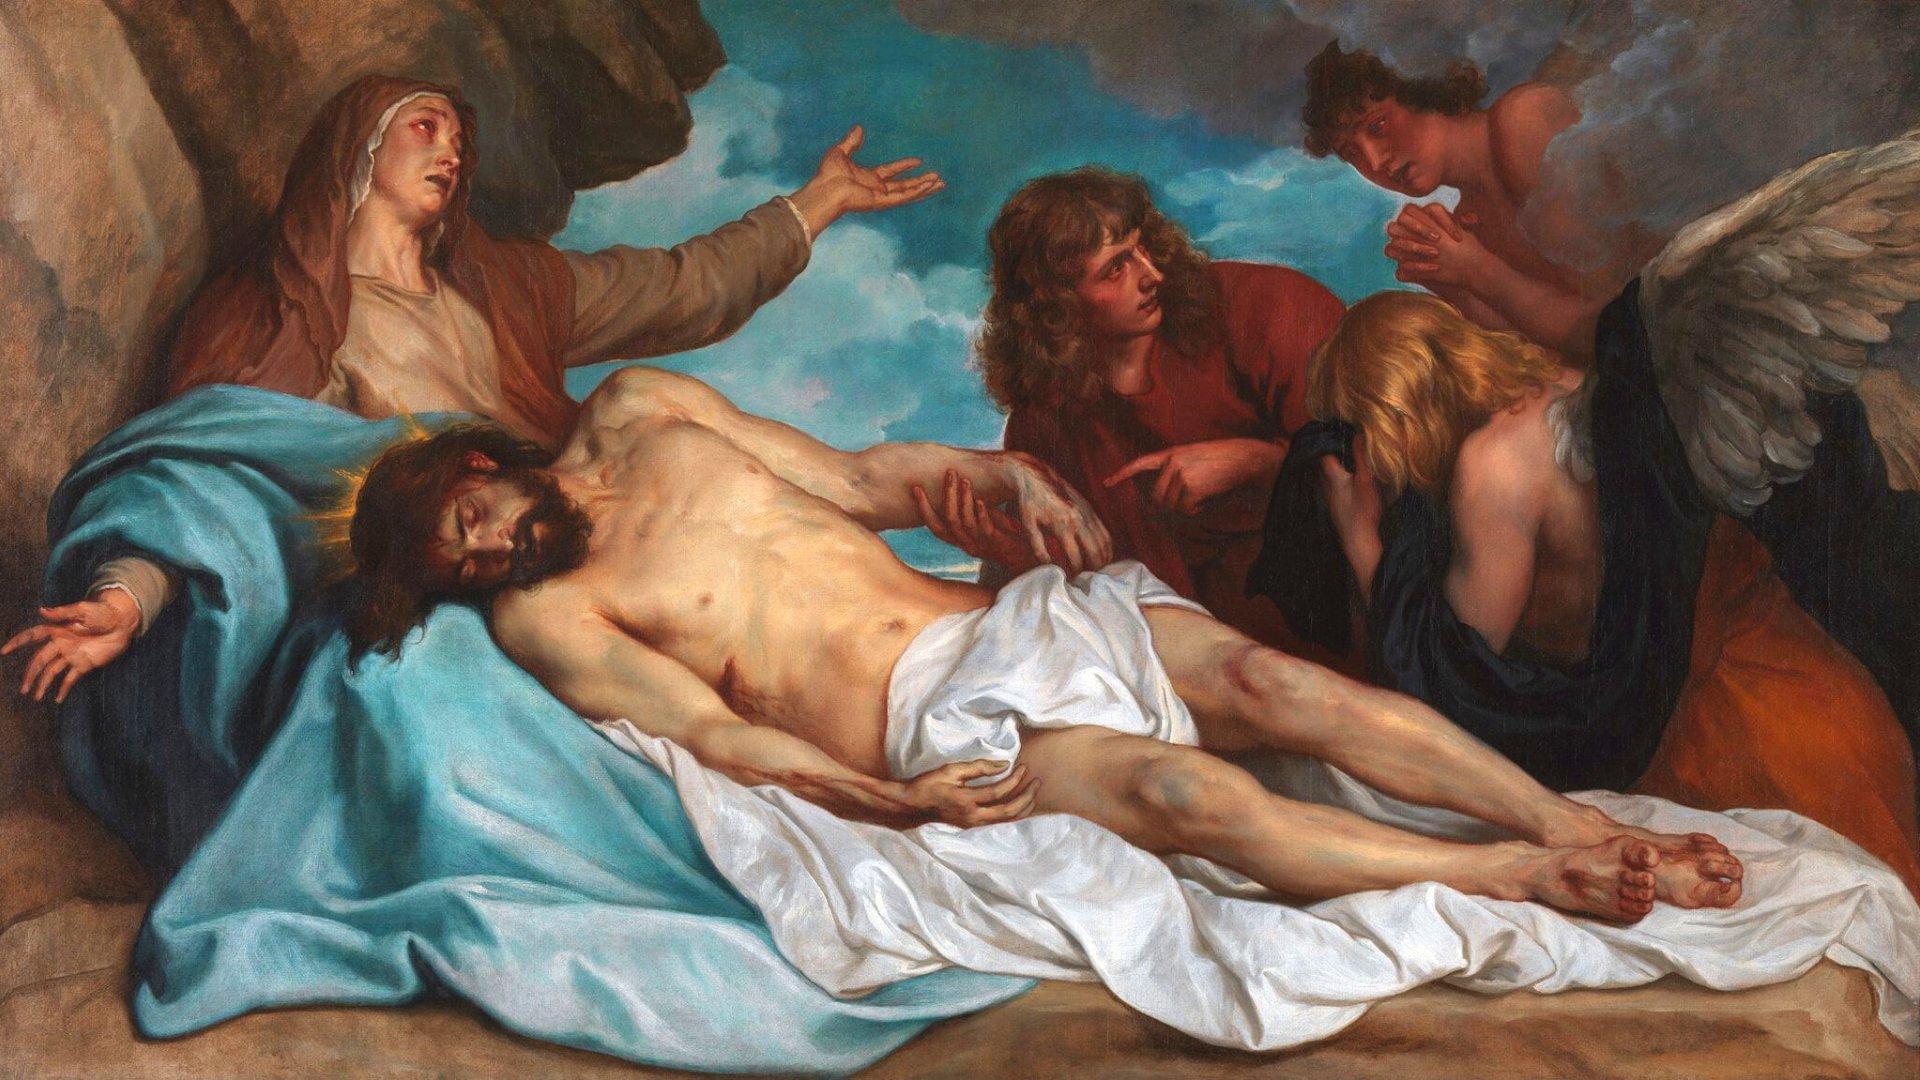 Nossa Senhora com Jesus Cristo morto